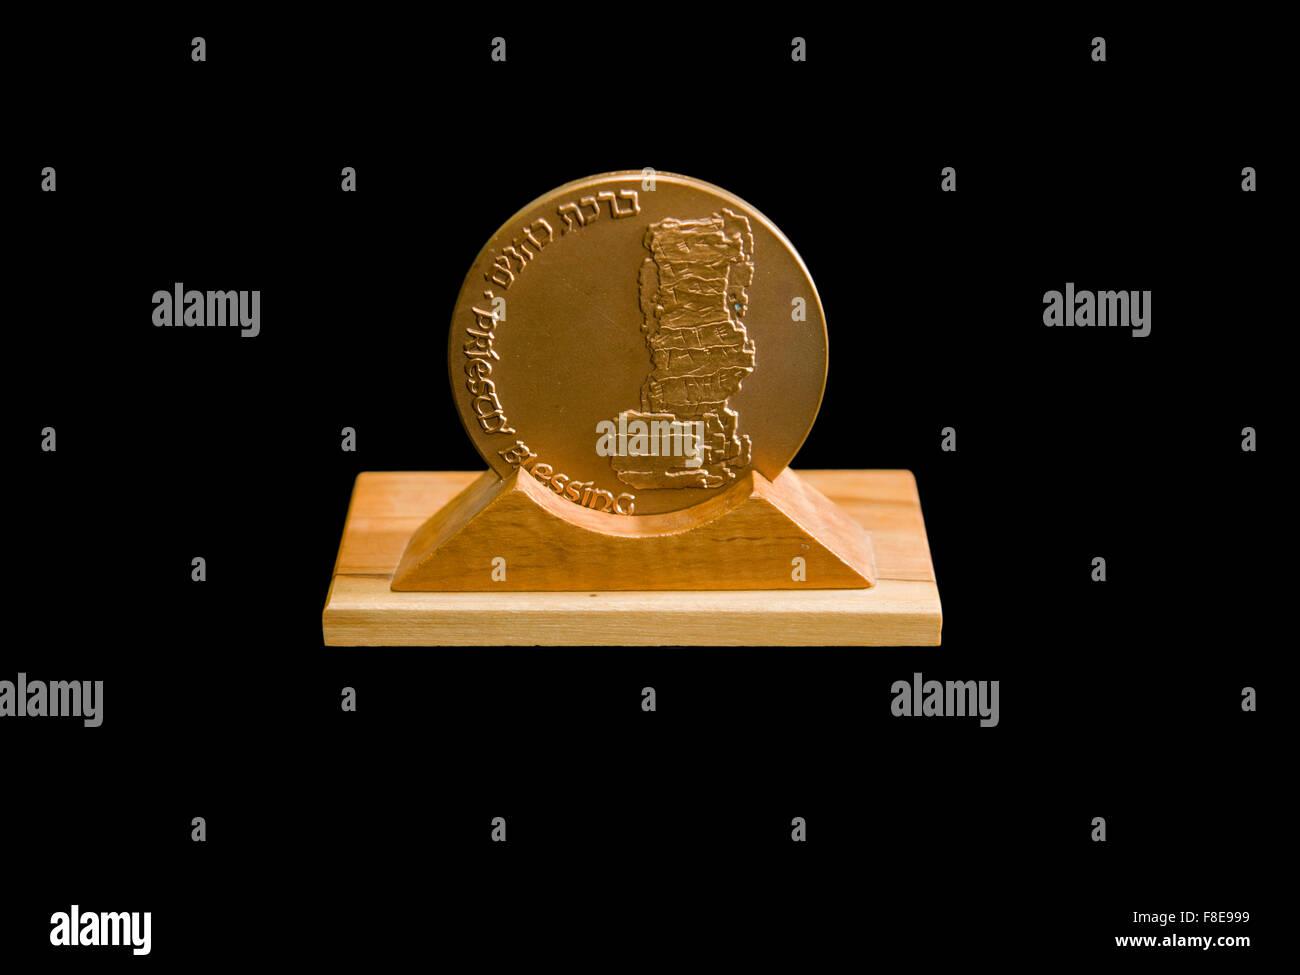 Israeli Priestly Blessing bronze Medal on black background - Stock Image